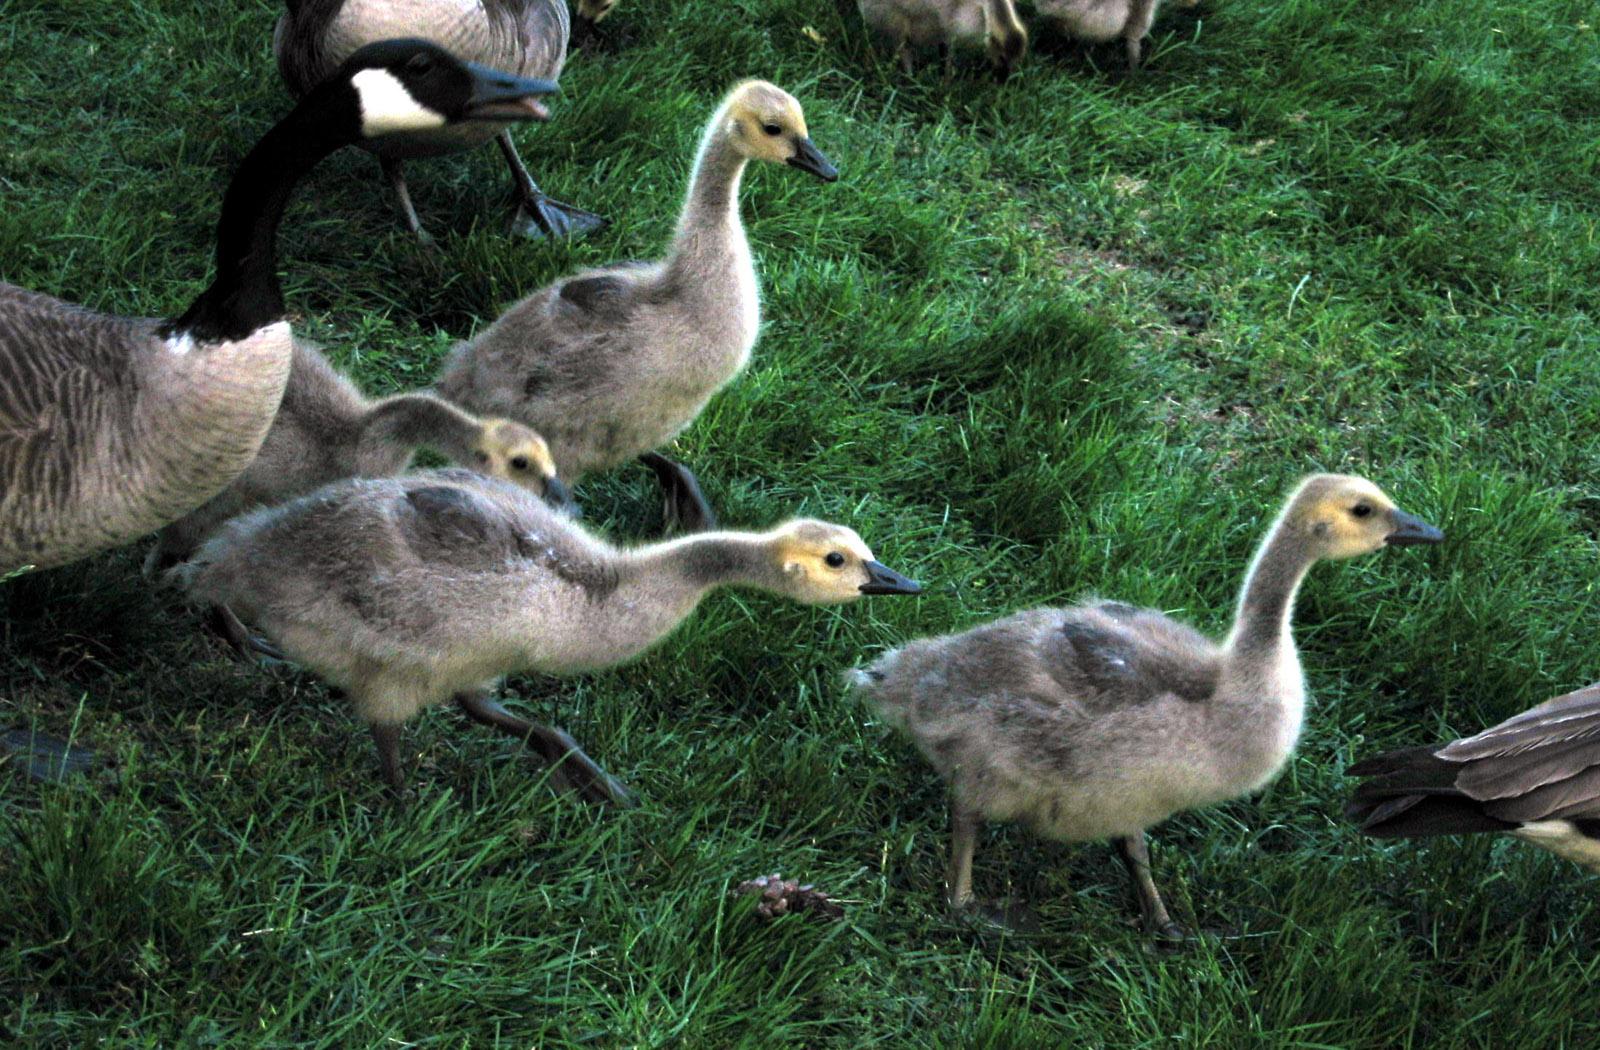 File:Goslings.jpg - Wikimedia Commons